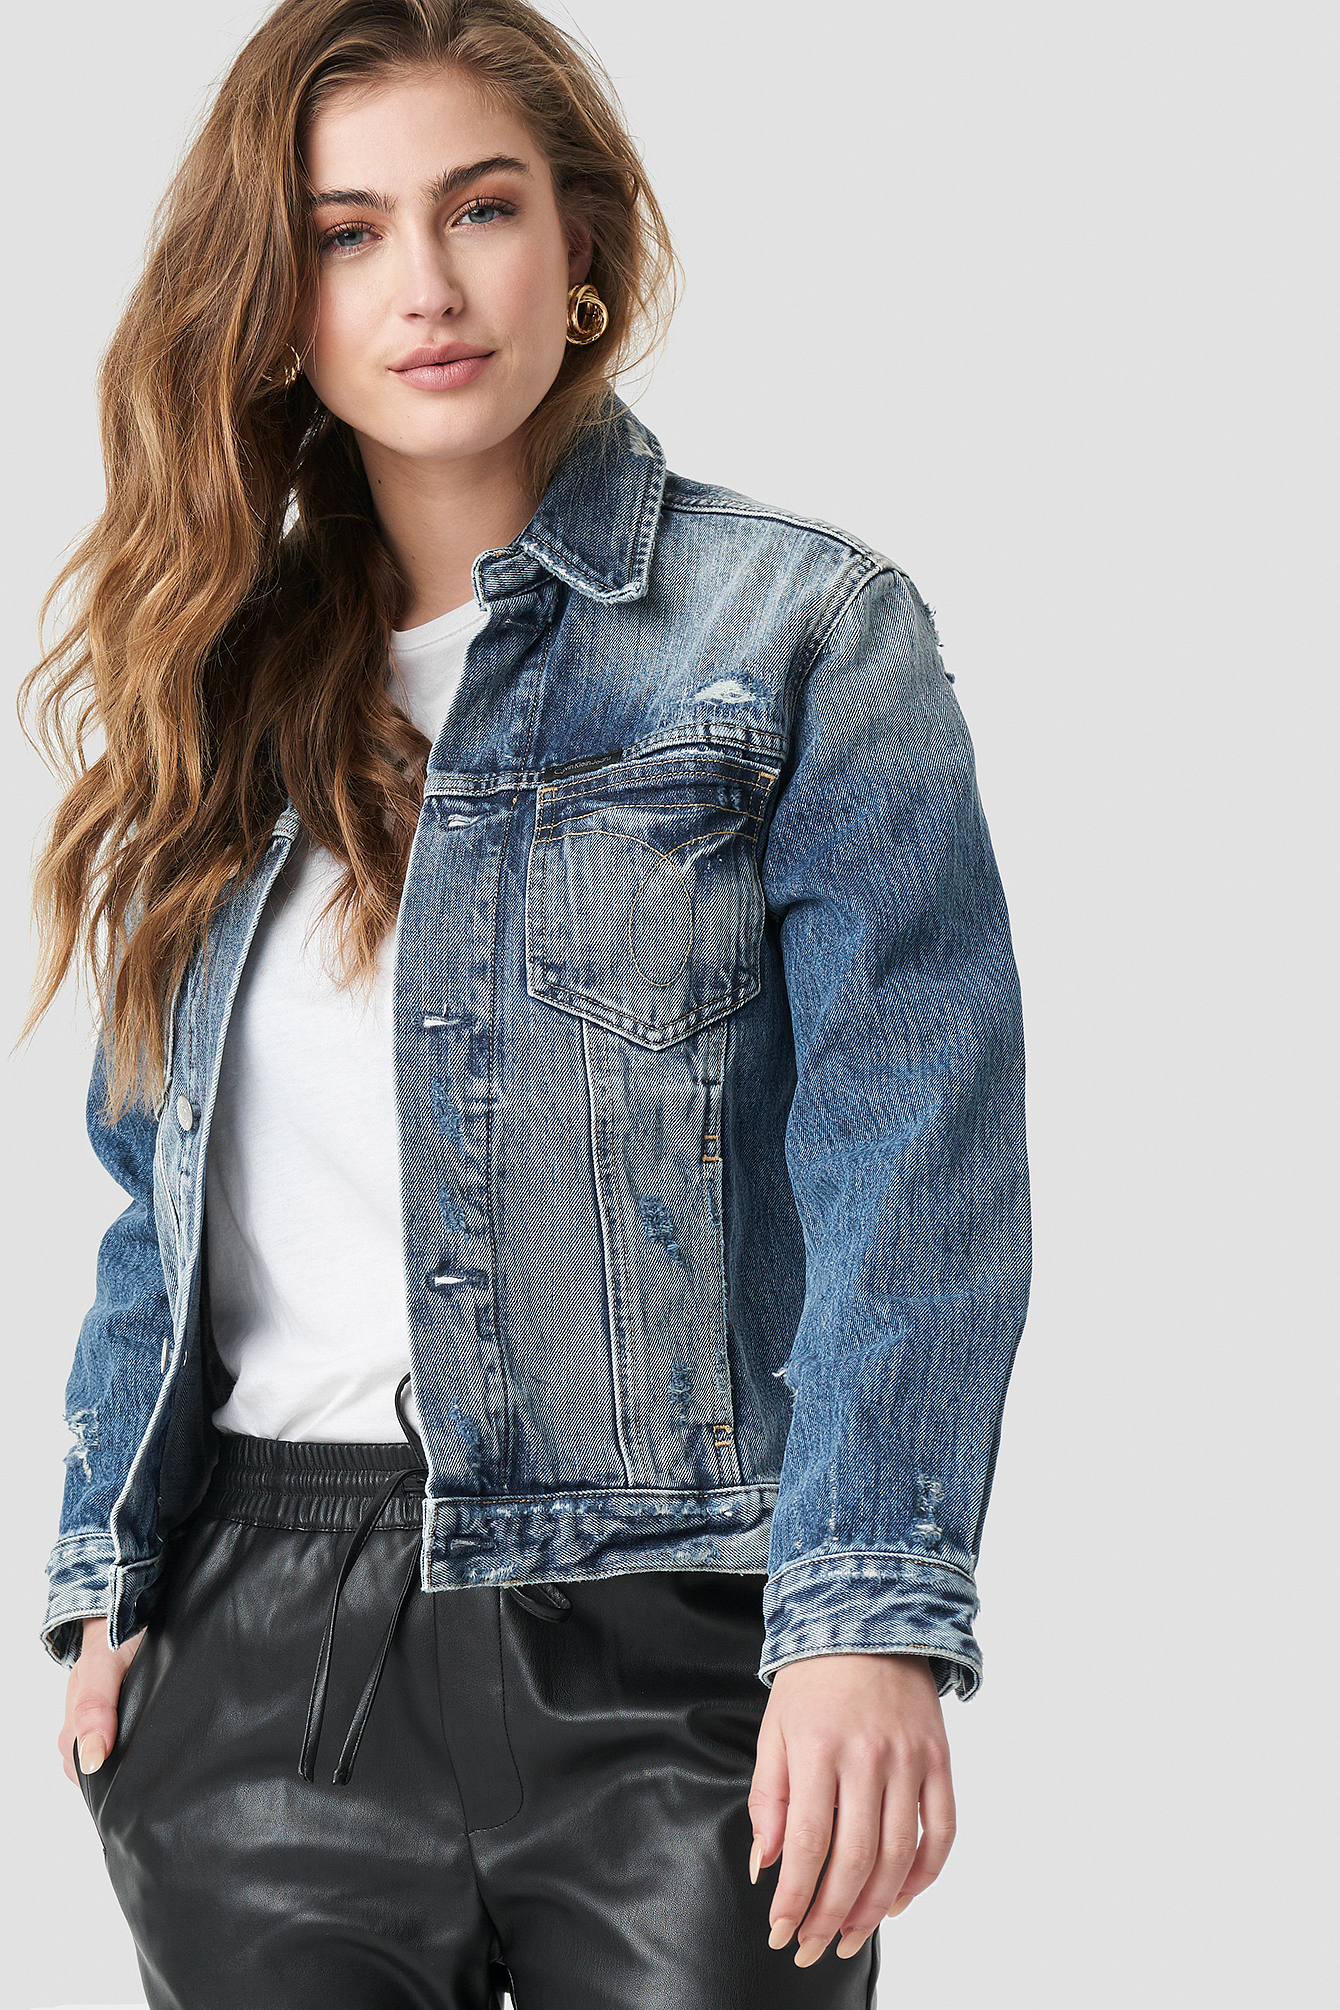 Calvin Klein Foundation Omega Trucker Jacket - Blue